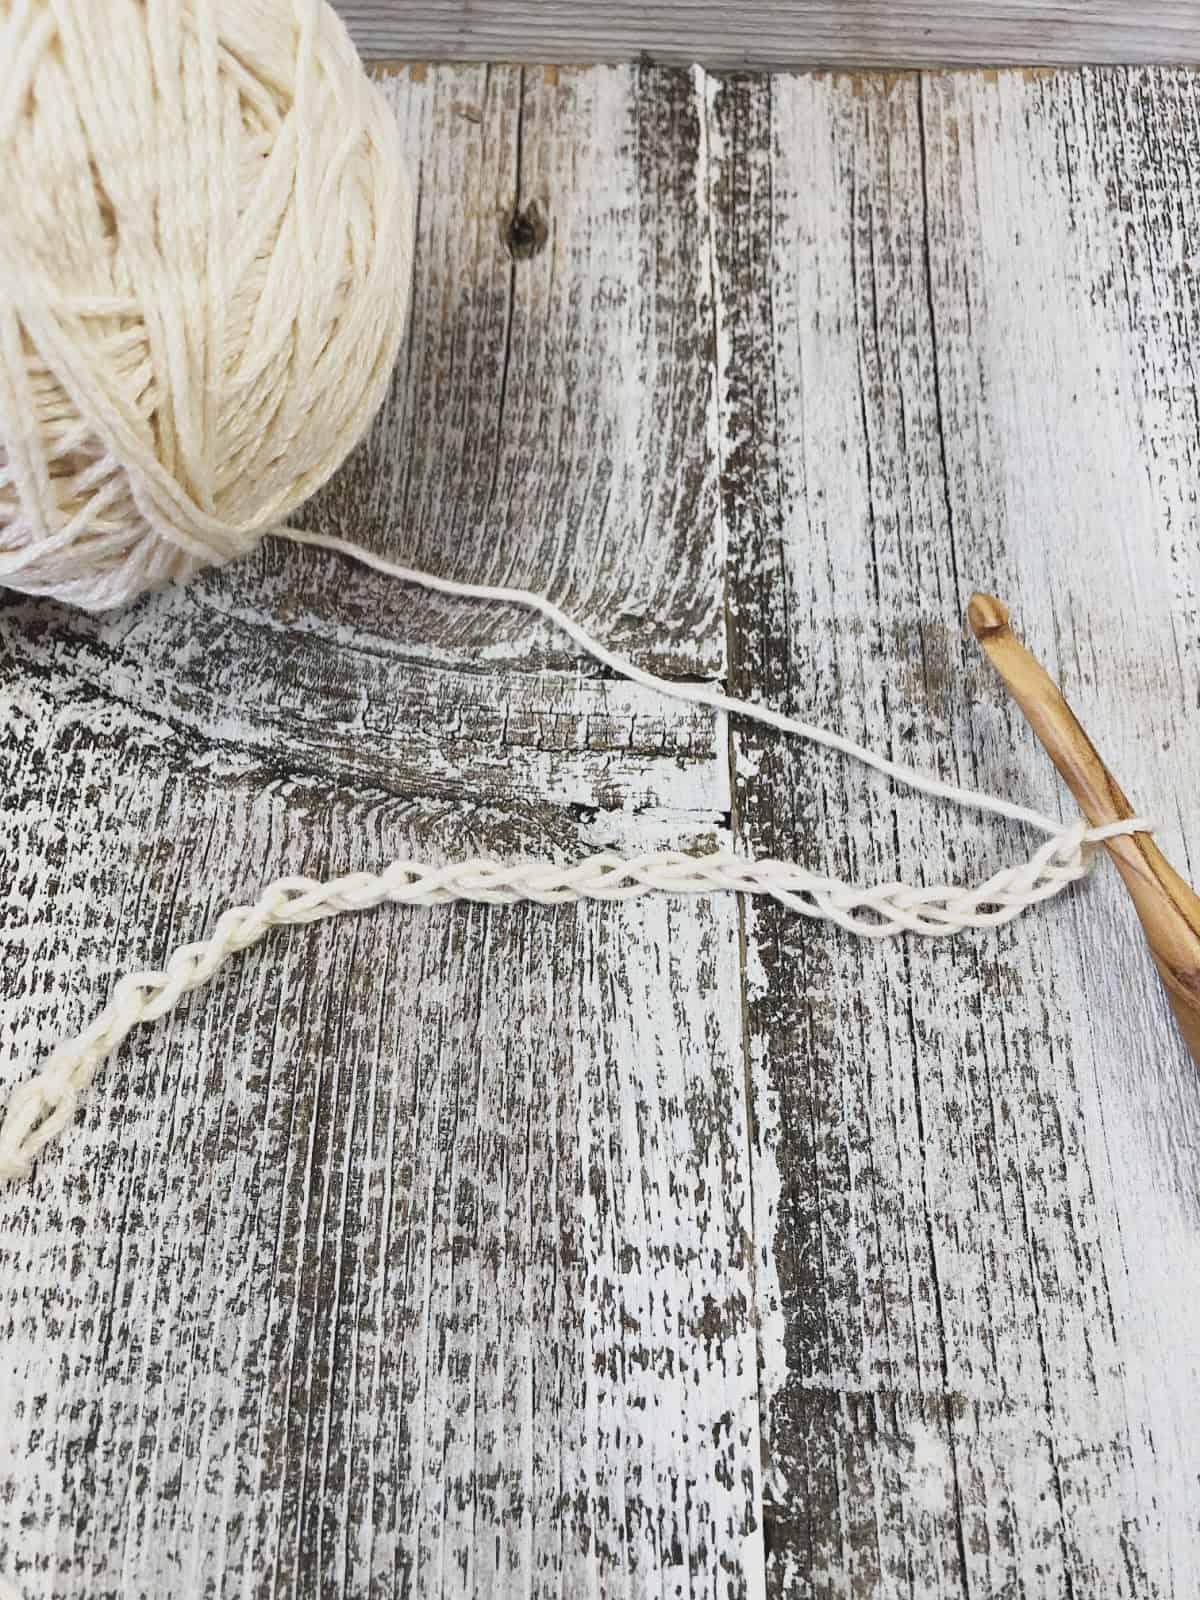 Crochet chain of 20.